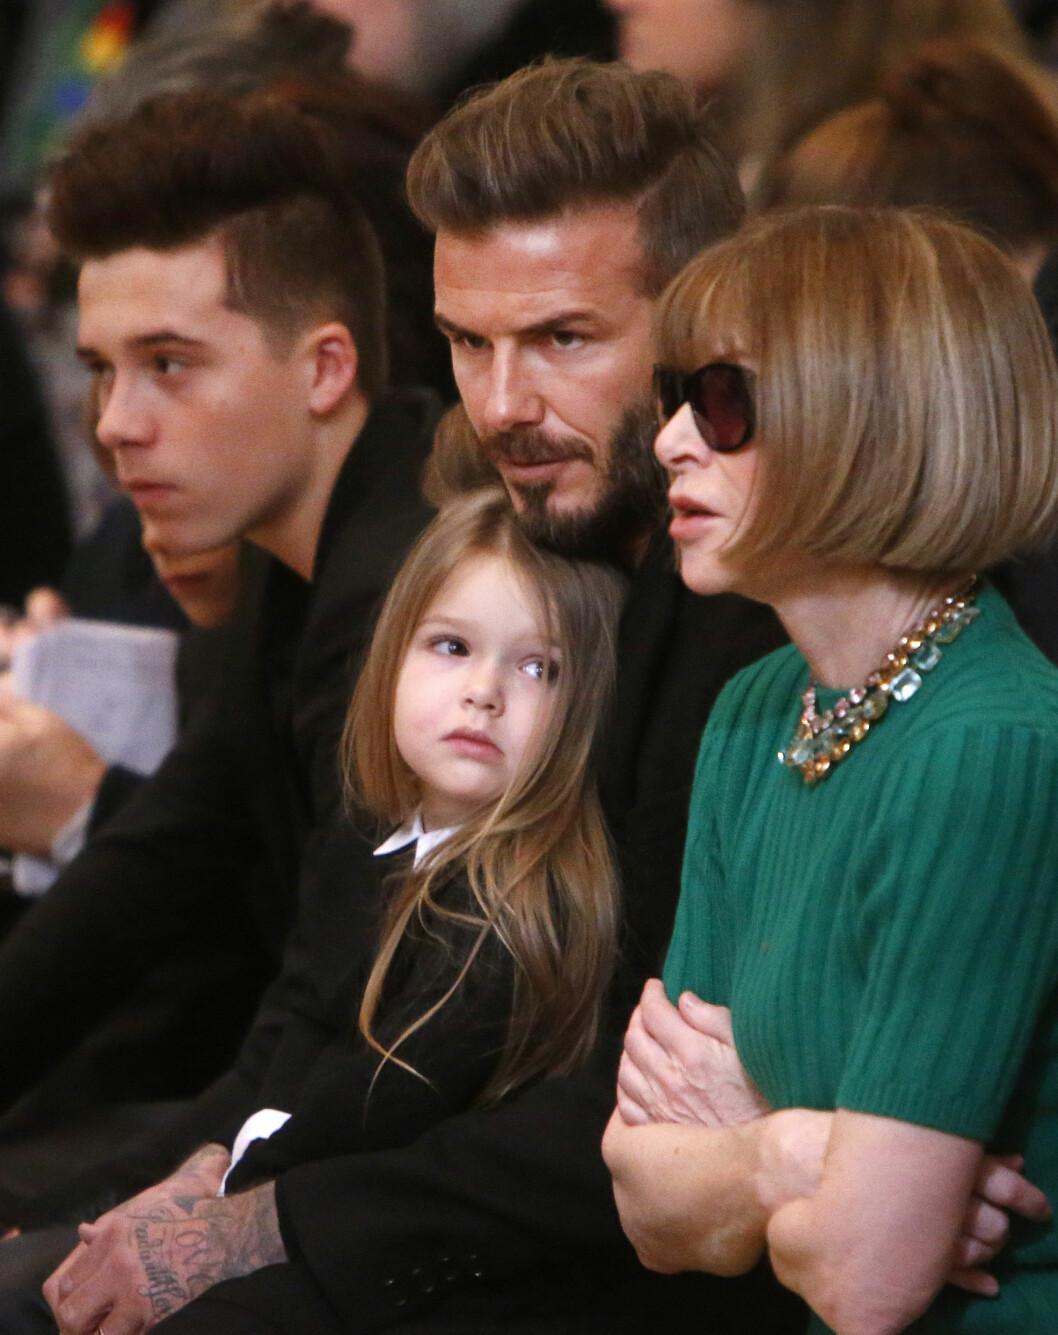 PÅ PAPPAS FANG: Harper Beckhem sitter trygt på pappas fang under New York Fashion Week. Harper lar seg fascinere av Vogue-redaktør Anna Wintour. Foto: NTB Scanpix